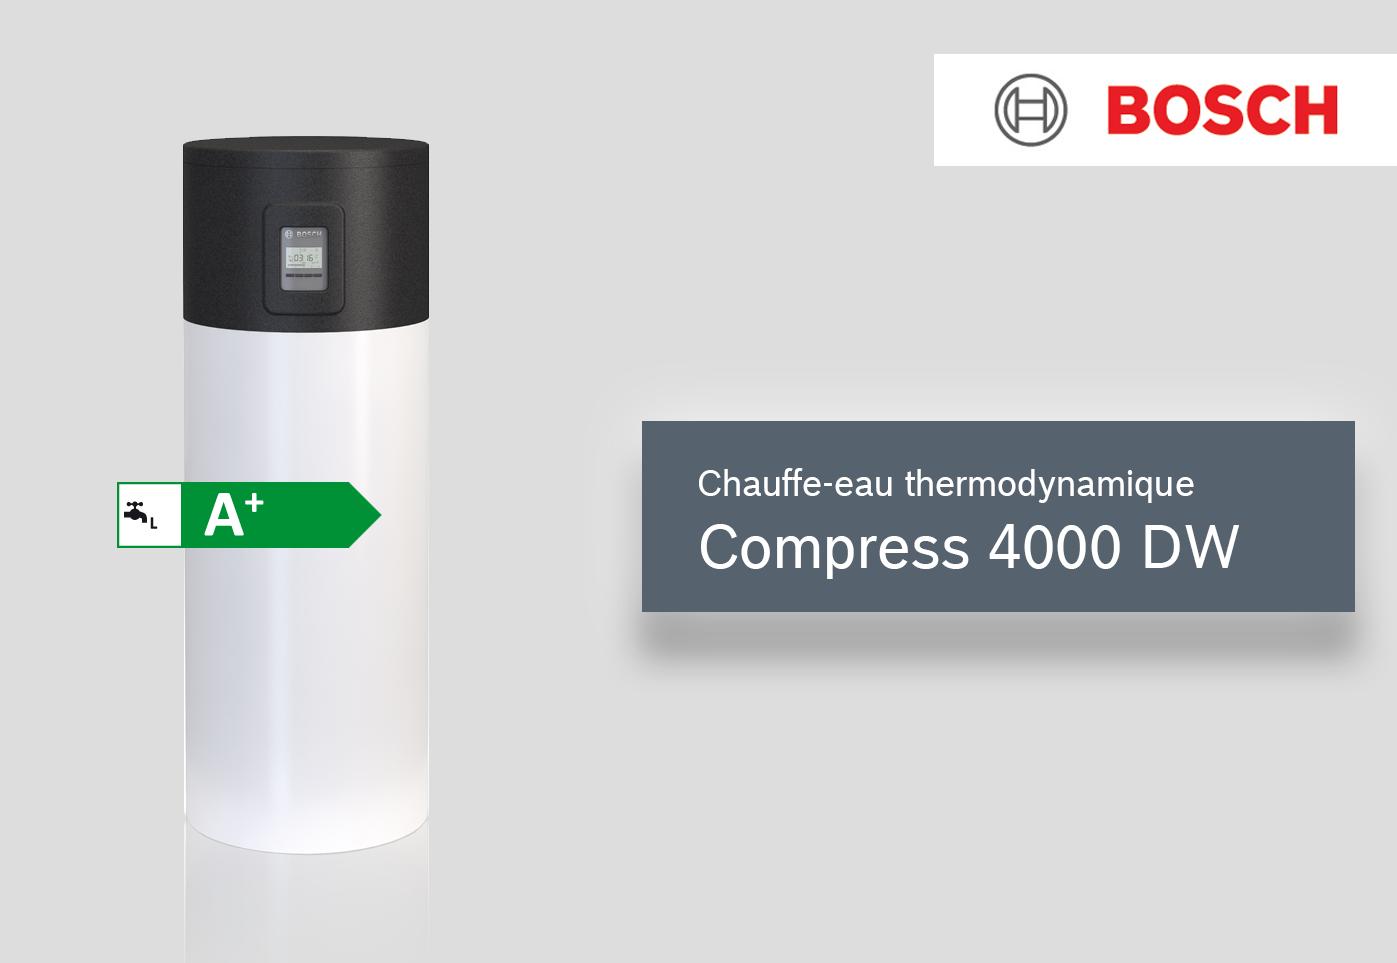 COMPRESS 4000 DW